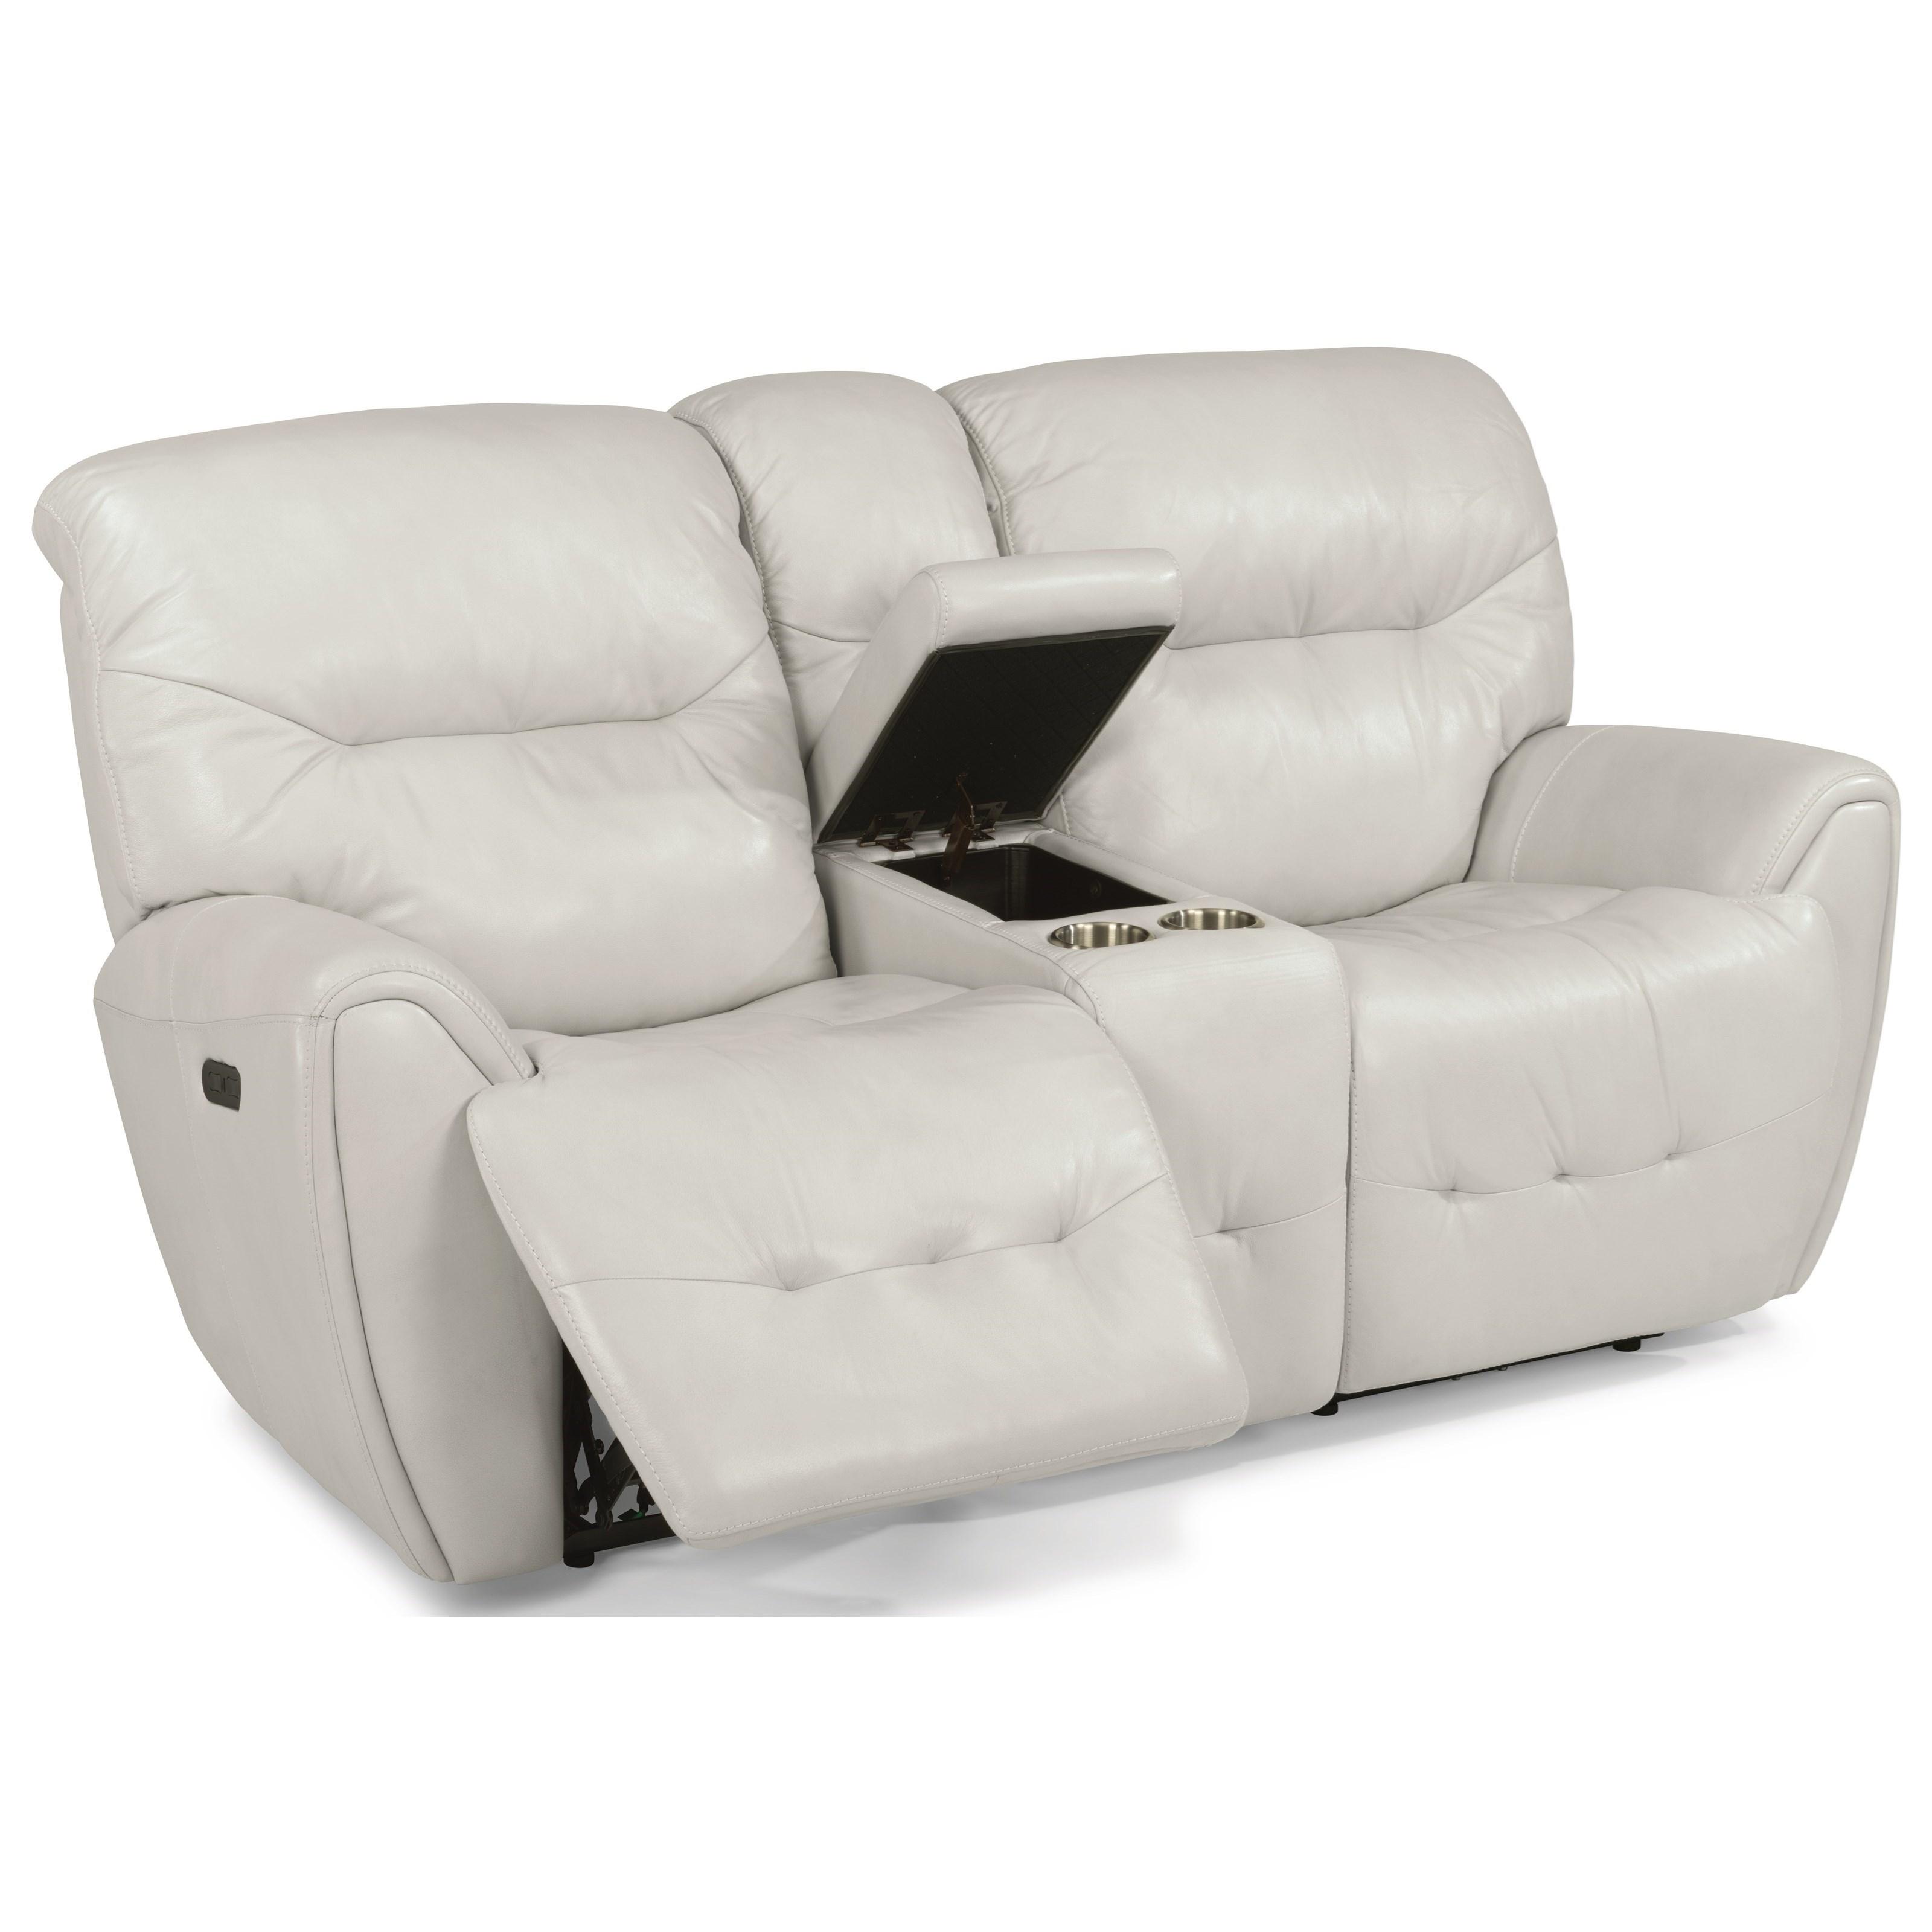 flexsteel reclining sofa warranty old set olx in delhi latitudes blaise contemporary power